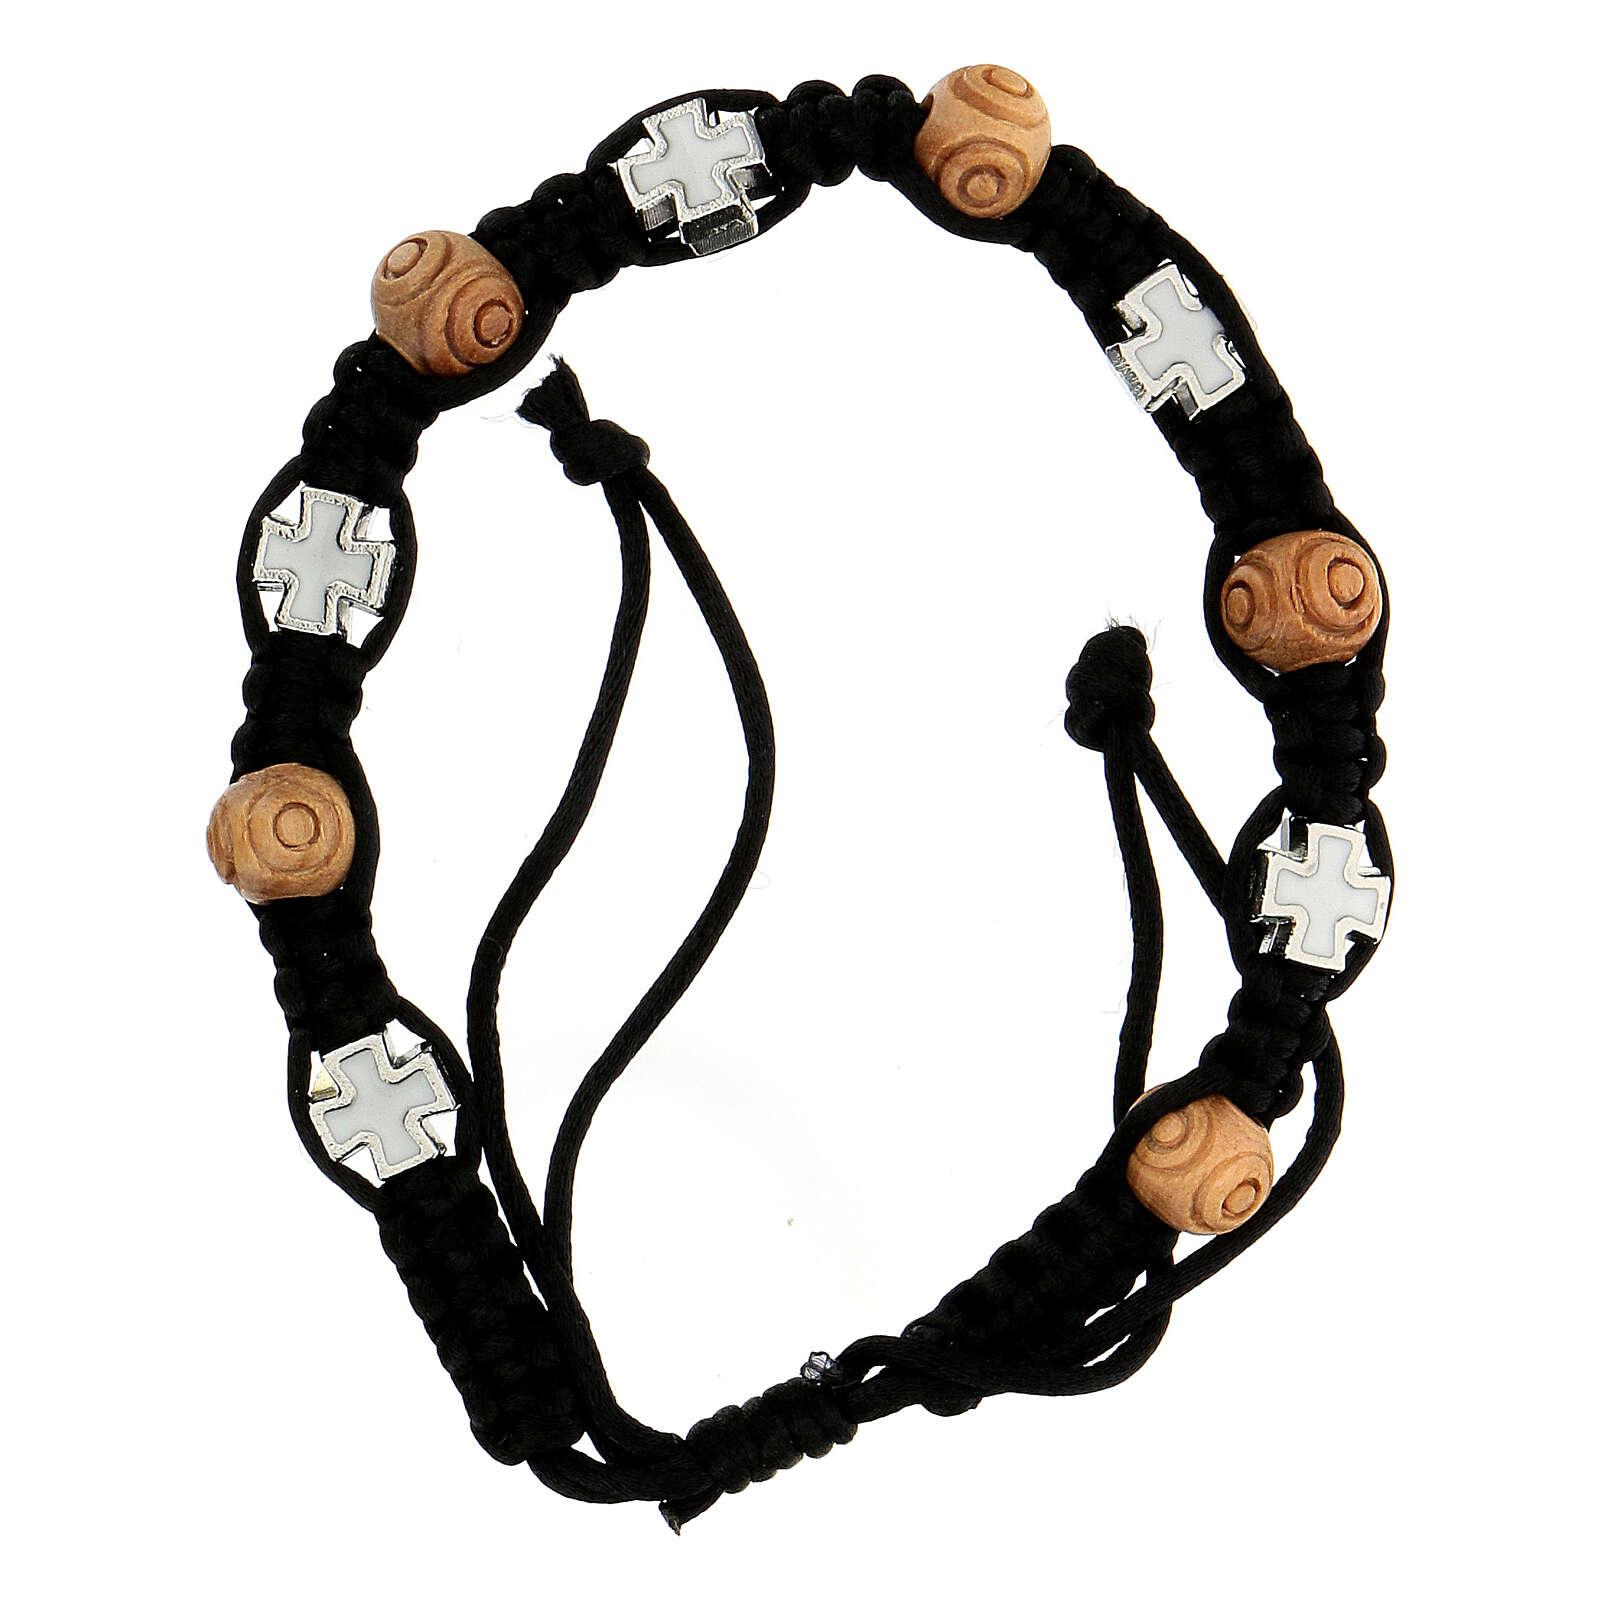 Bracciale decina corda nera regolabile grani legno crocetta bianca 8x6 mm 4